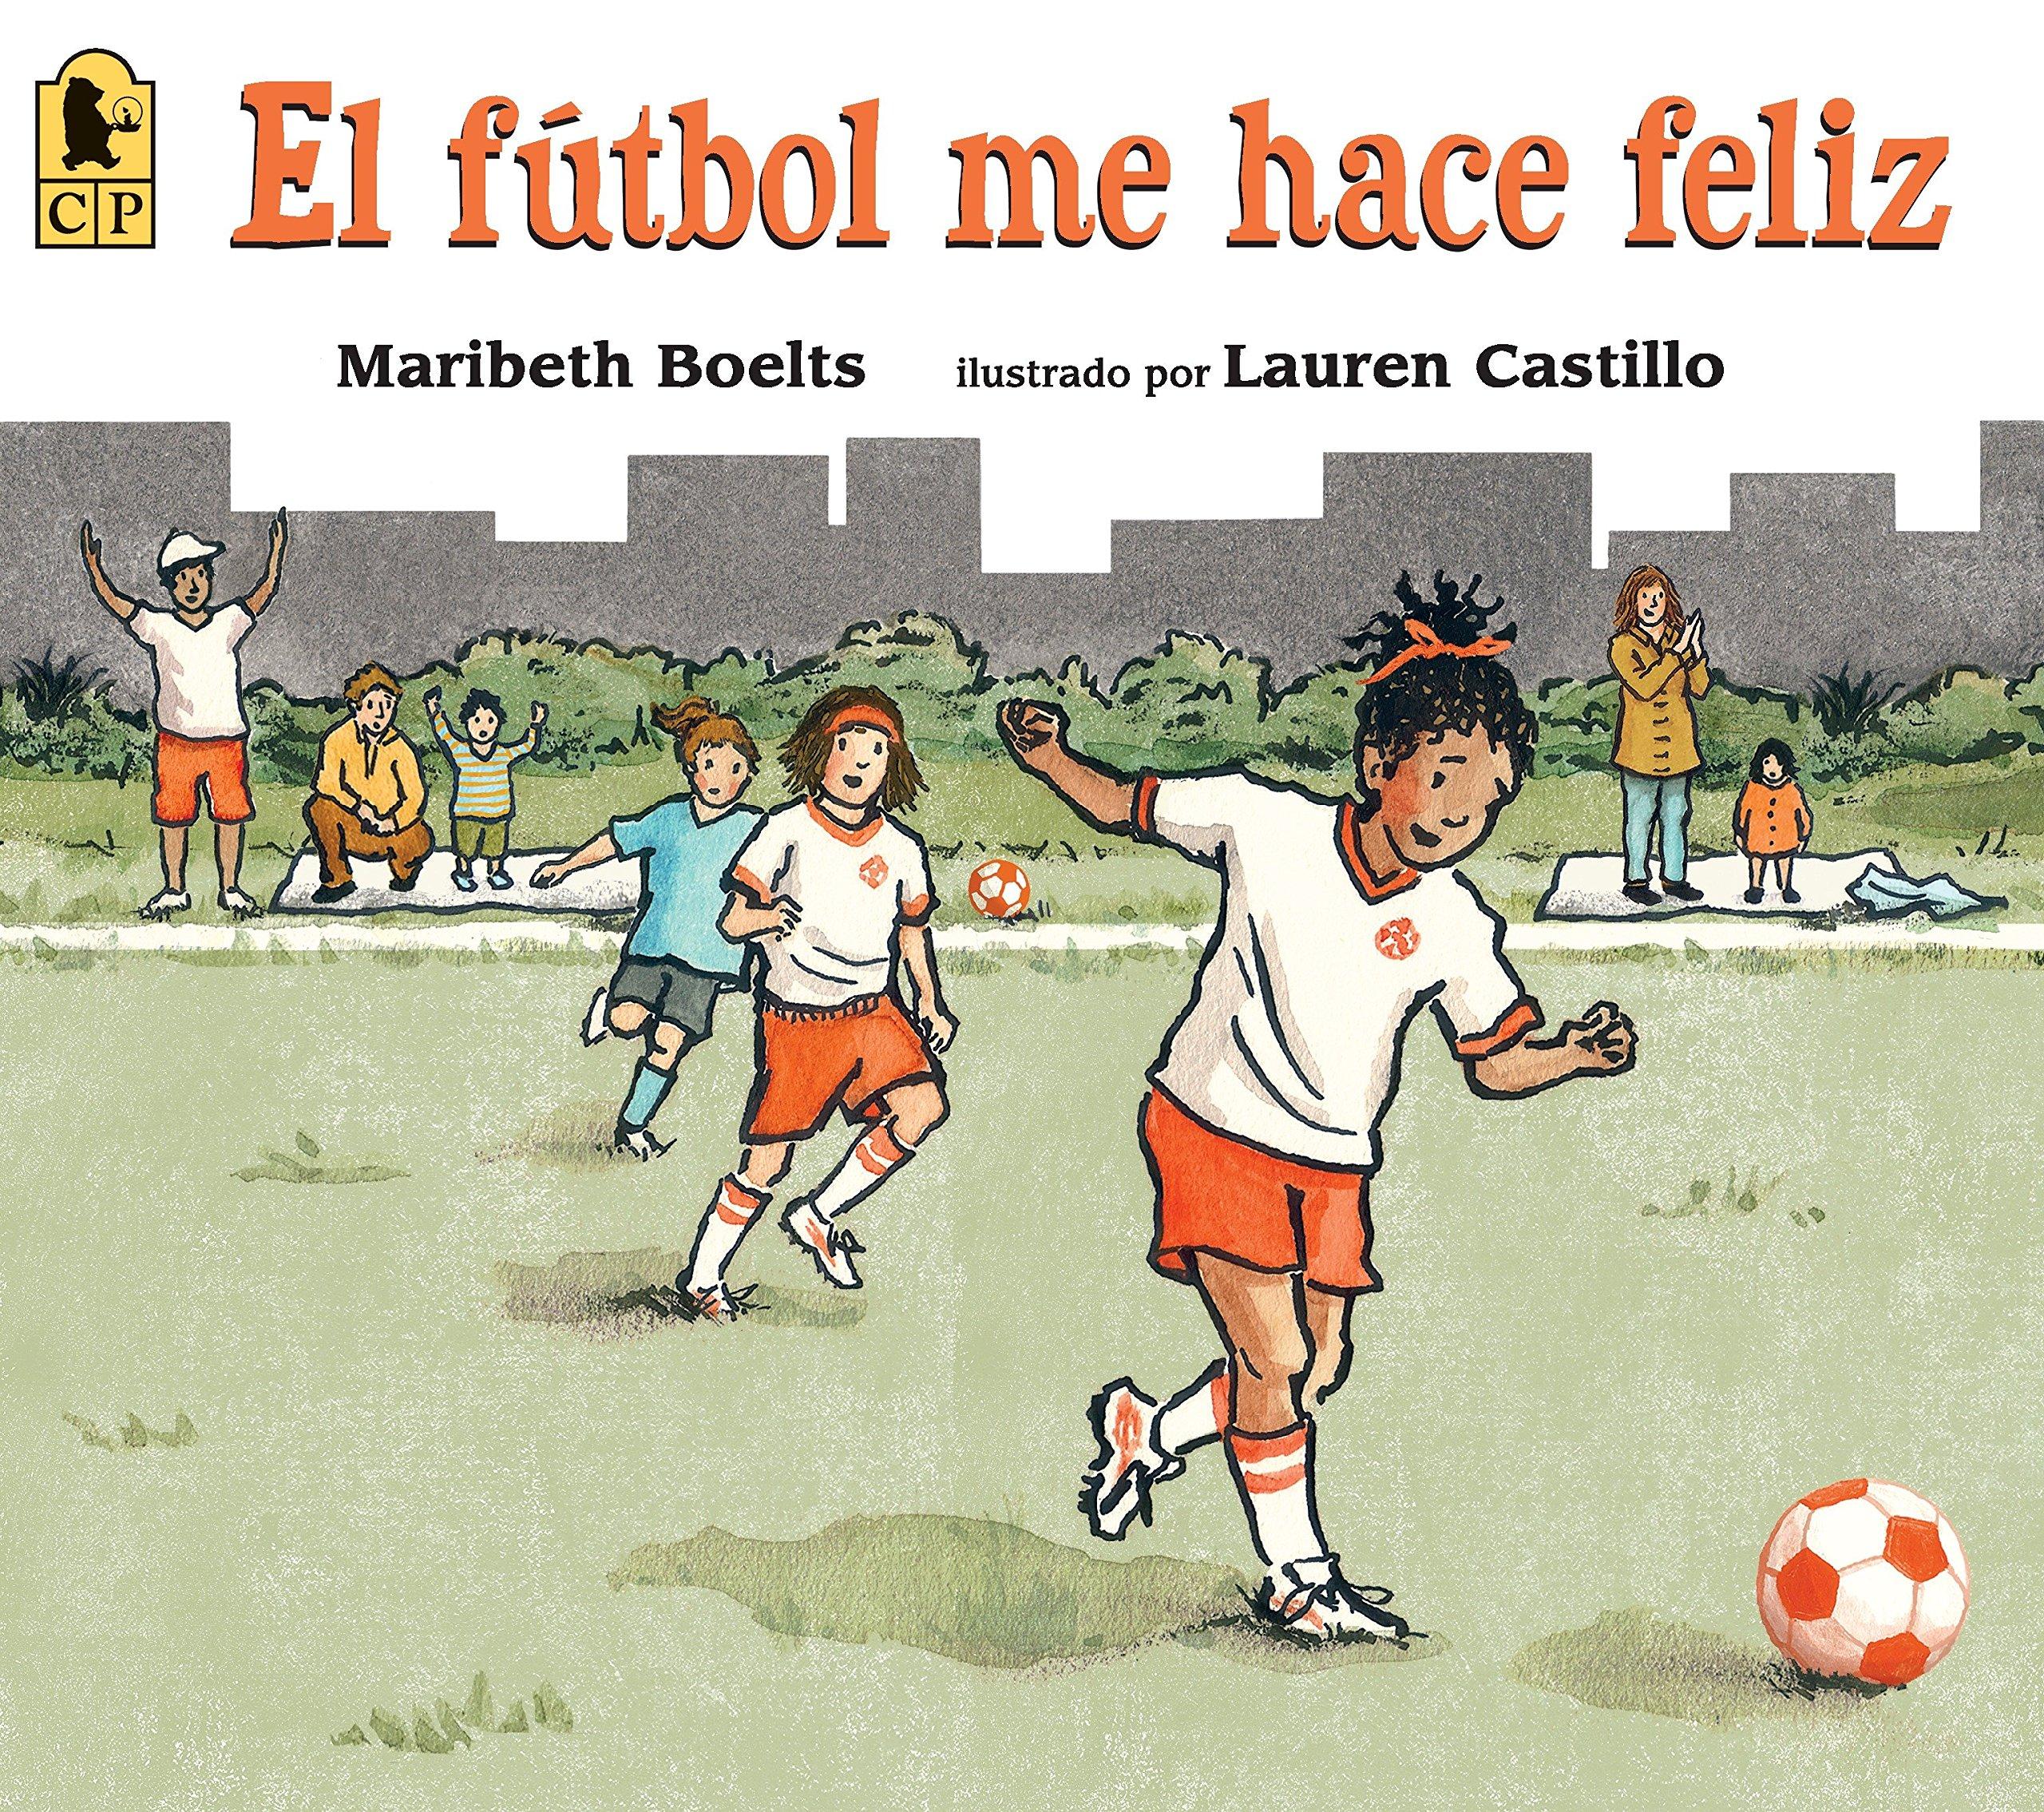 El fútbol me hace feliz (Spanish Edition) (Spanish) Paperback – September 13, 2016